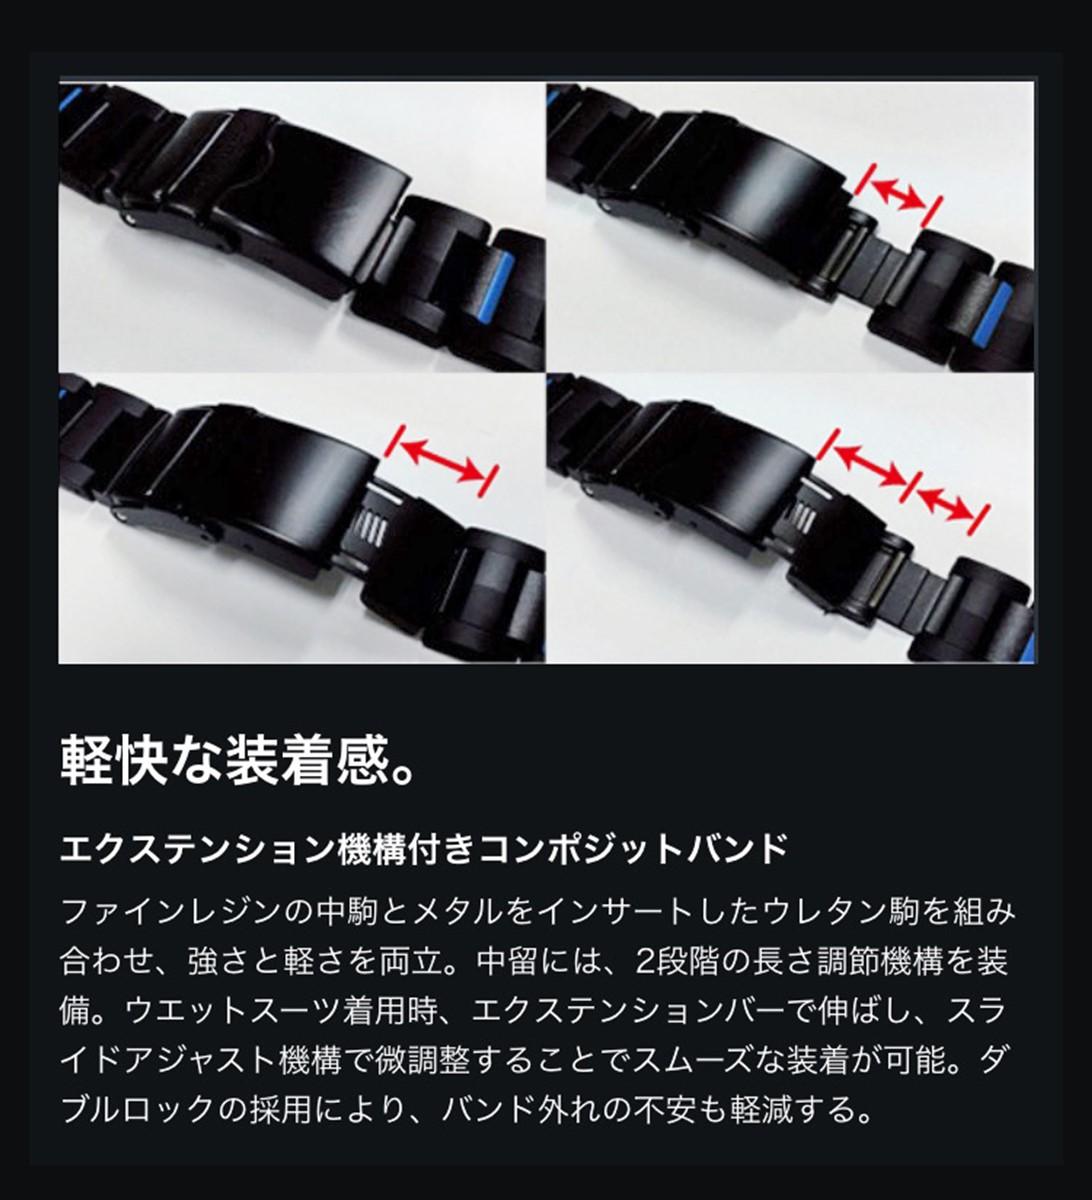 Casio G shock GWN-Q1000MC-1AJF Gulf master Quad-sensor signal solar mens watch composite band CASIO g-shock 10/28 released